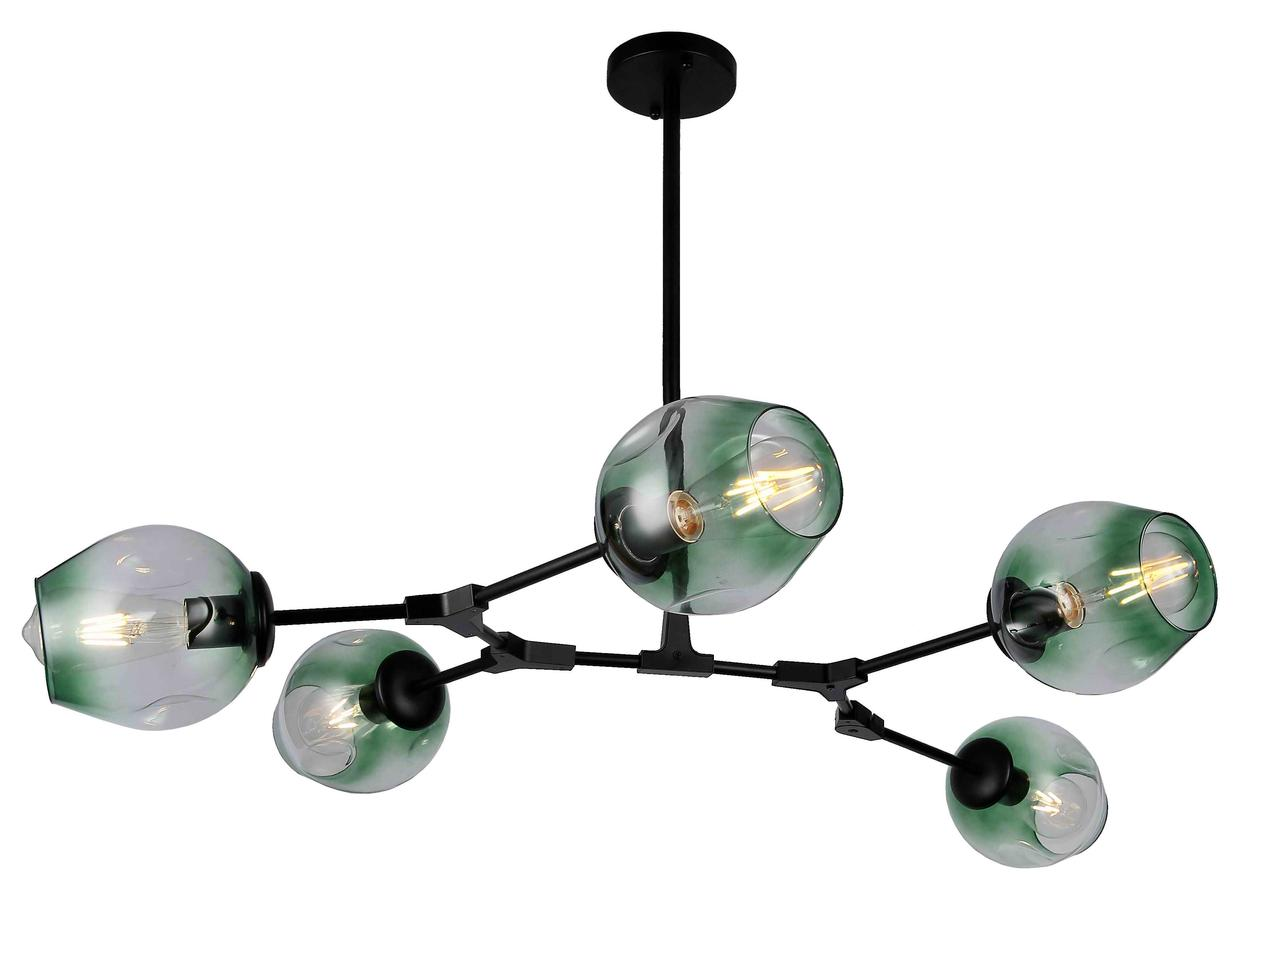 Люстра молекула Levistella 752L7731-5 BK+GR